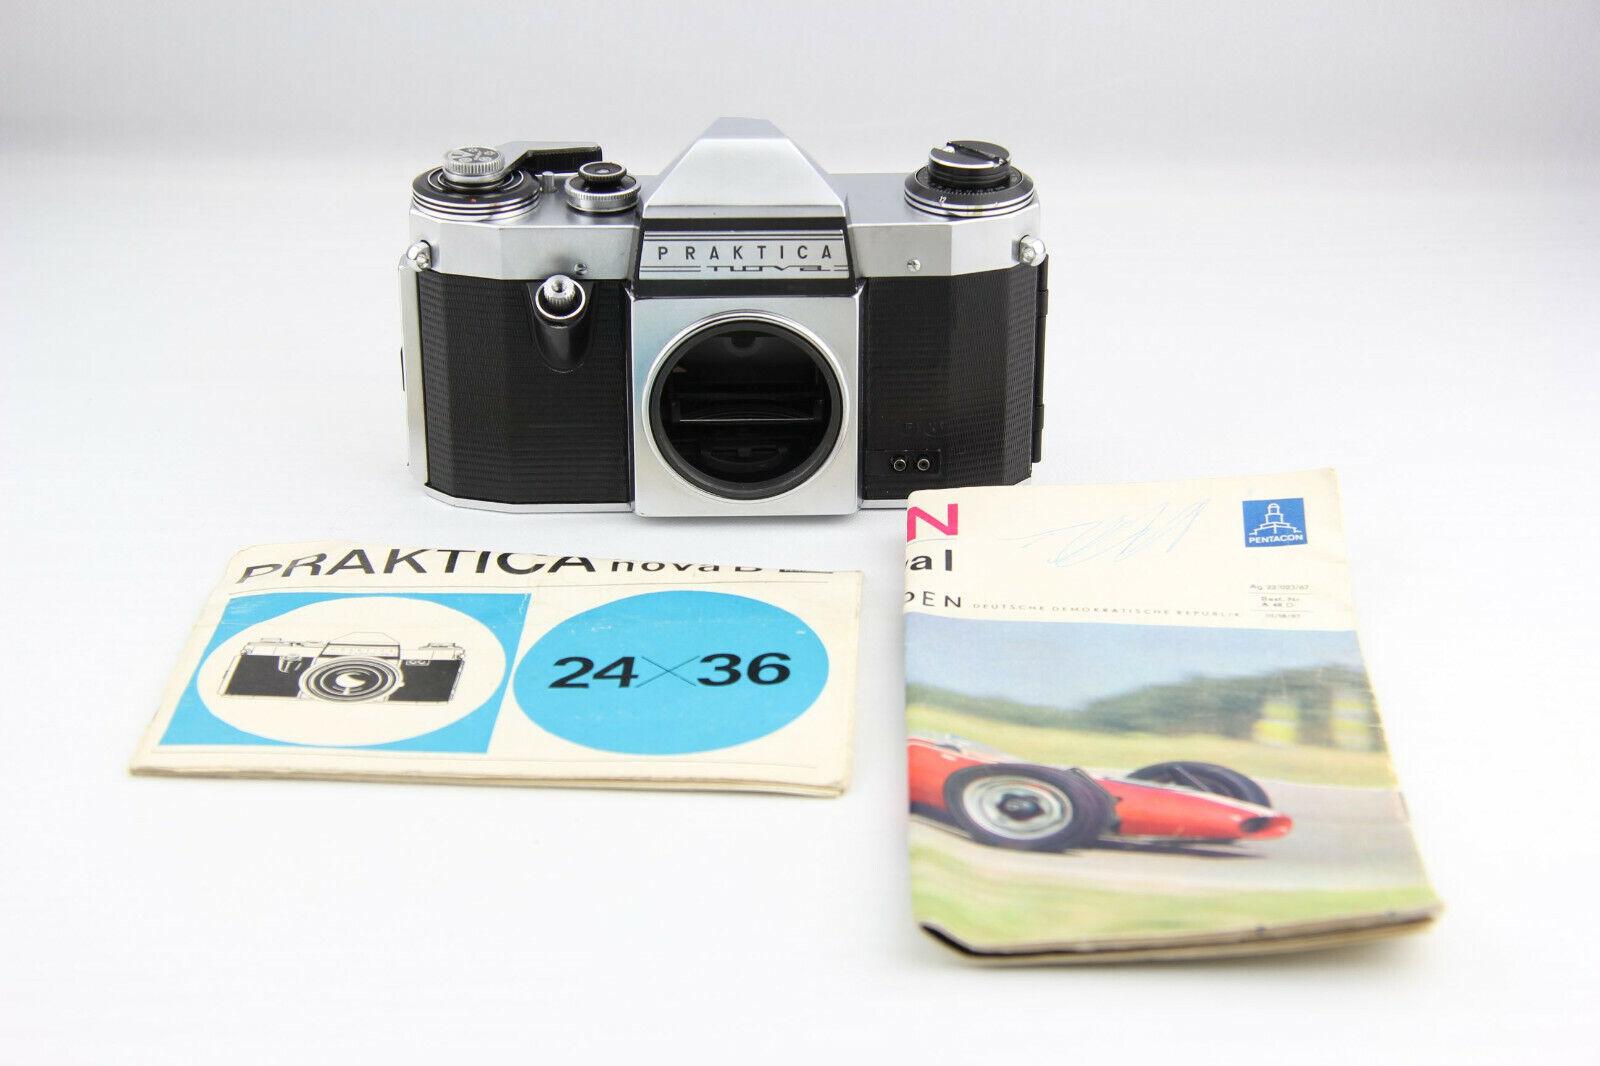 Praktica Nova M42 analoge Spiegelreflexkamera silber # 6477